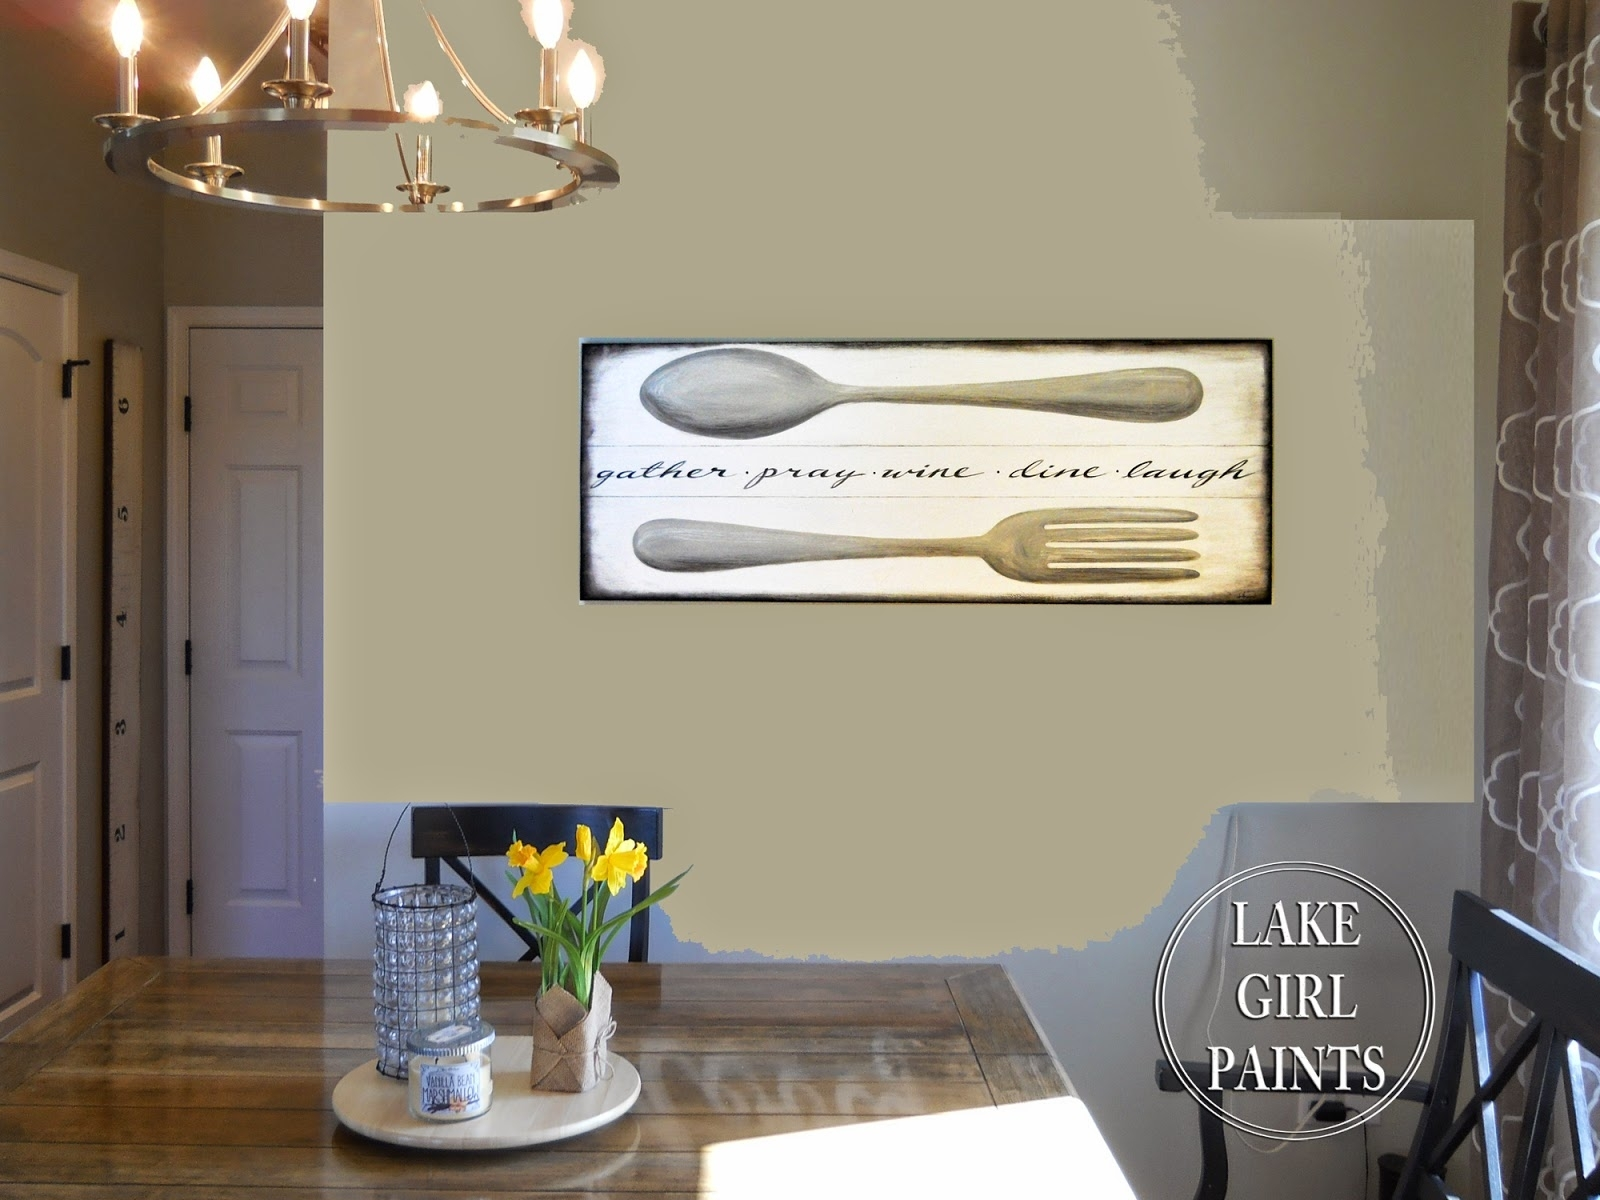 Lake Girl Paints: Making Dining Room Wall Art Within Dining Room Wall Art (View 13 of 20)